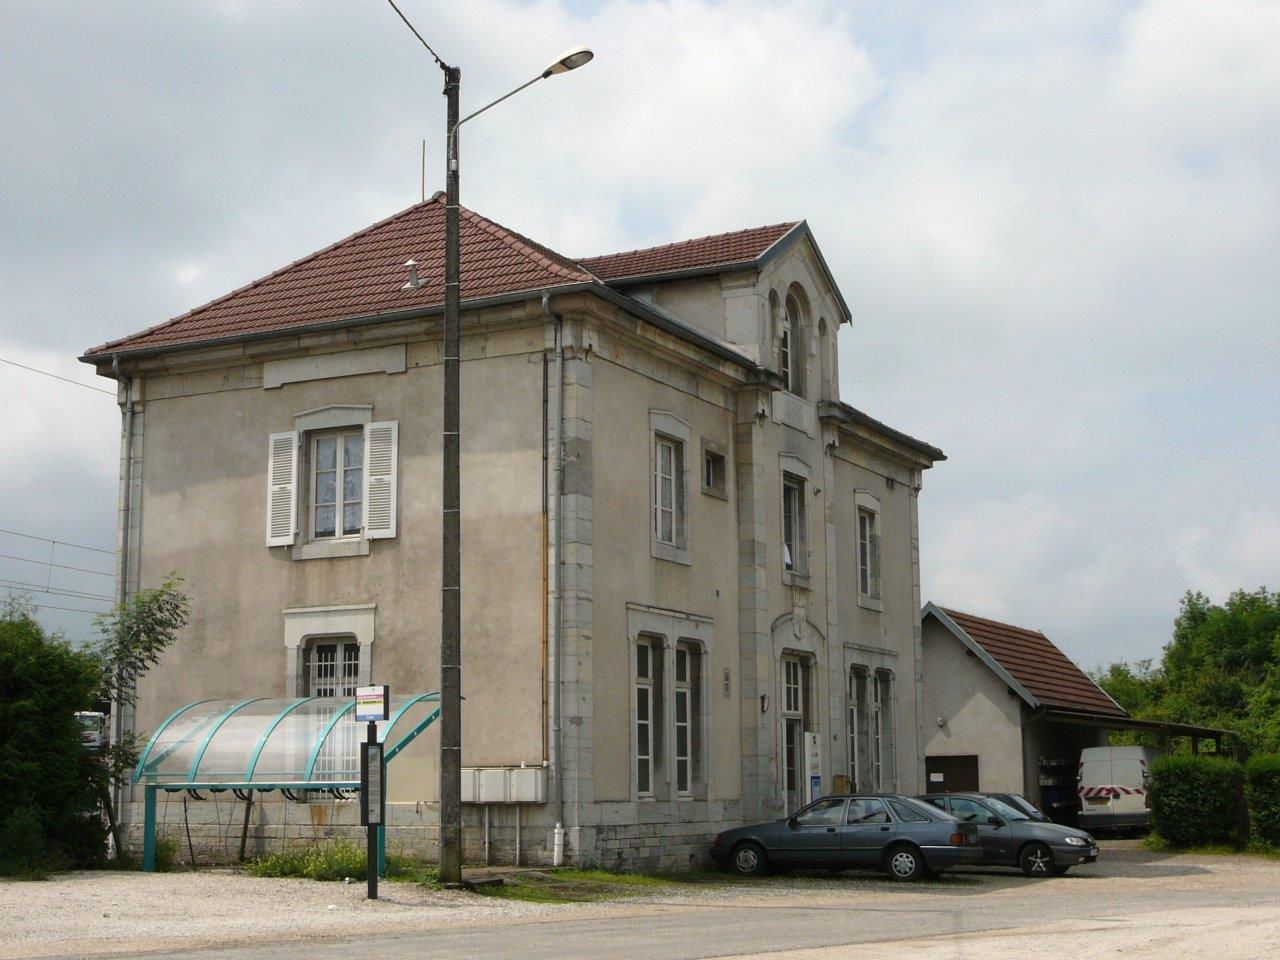 gare-de-franois-train-station